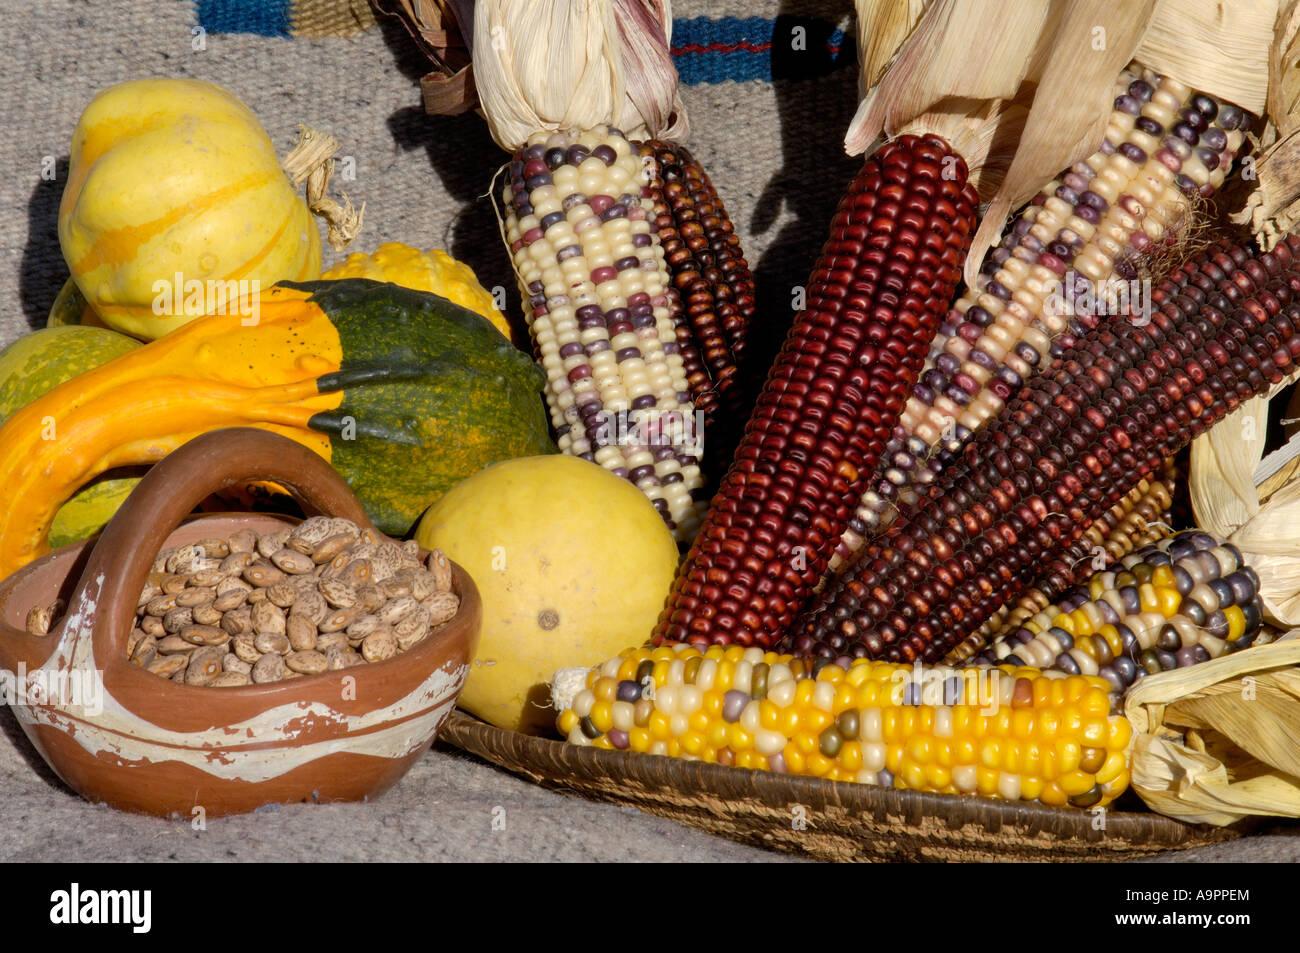 Image Result For American Corn Farm